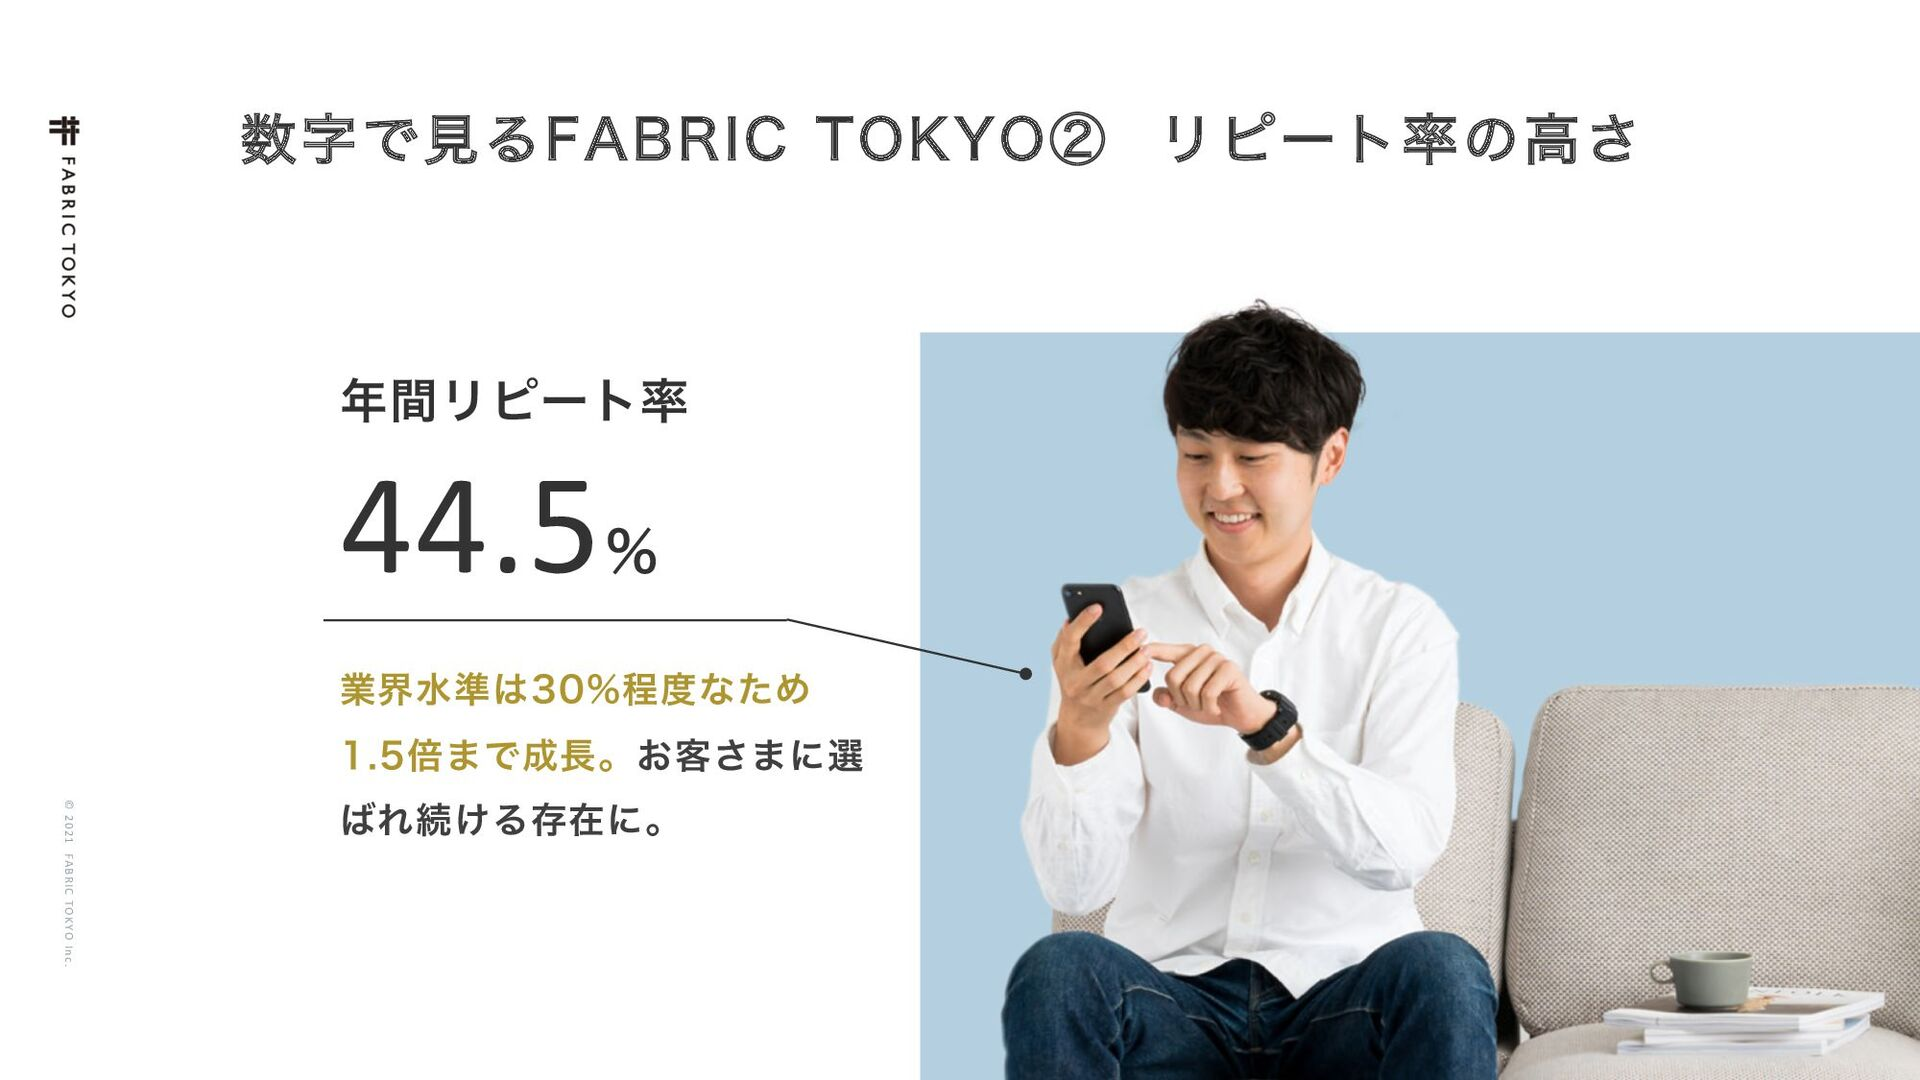 "© 2021 FABRIC TOKYO Inc. 19 ͰݟΔ'""#3*$50,:0ᶃ ..."